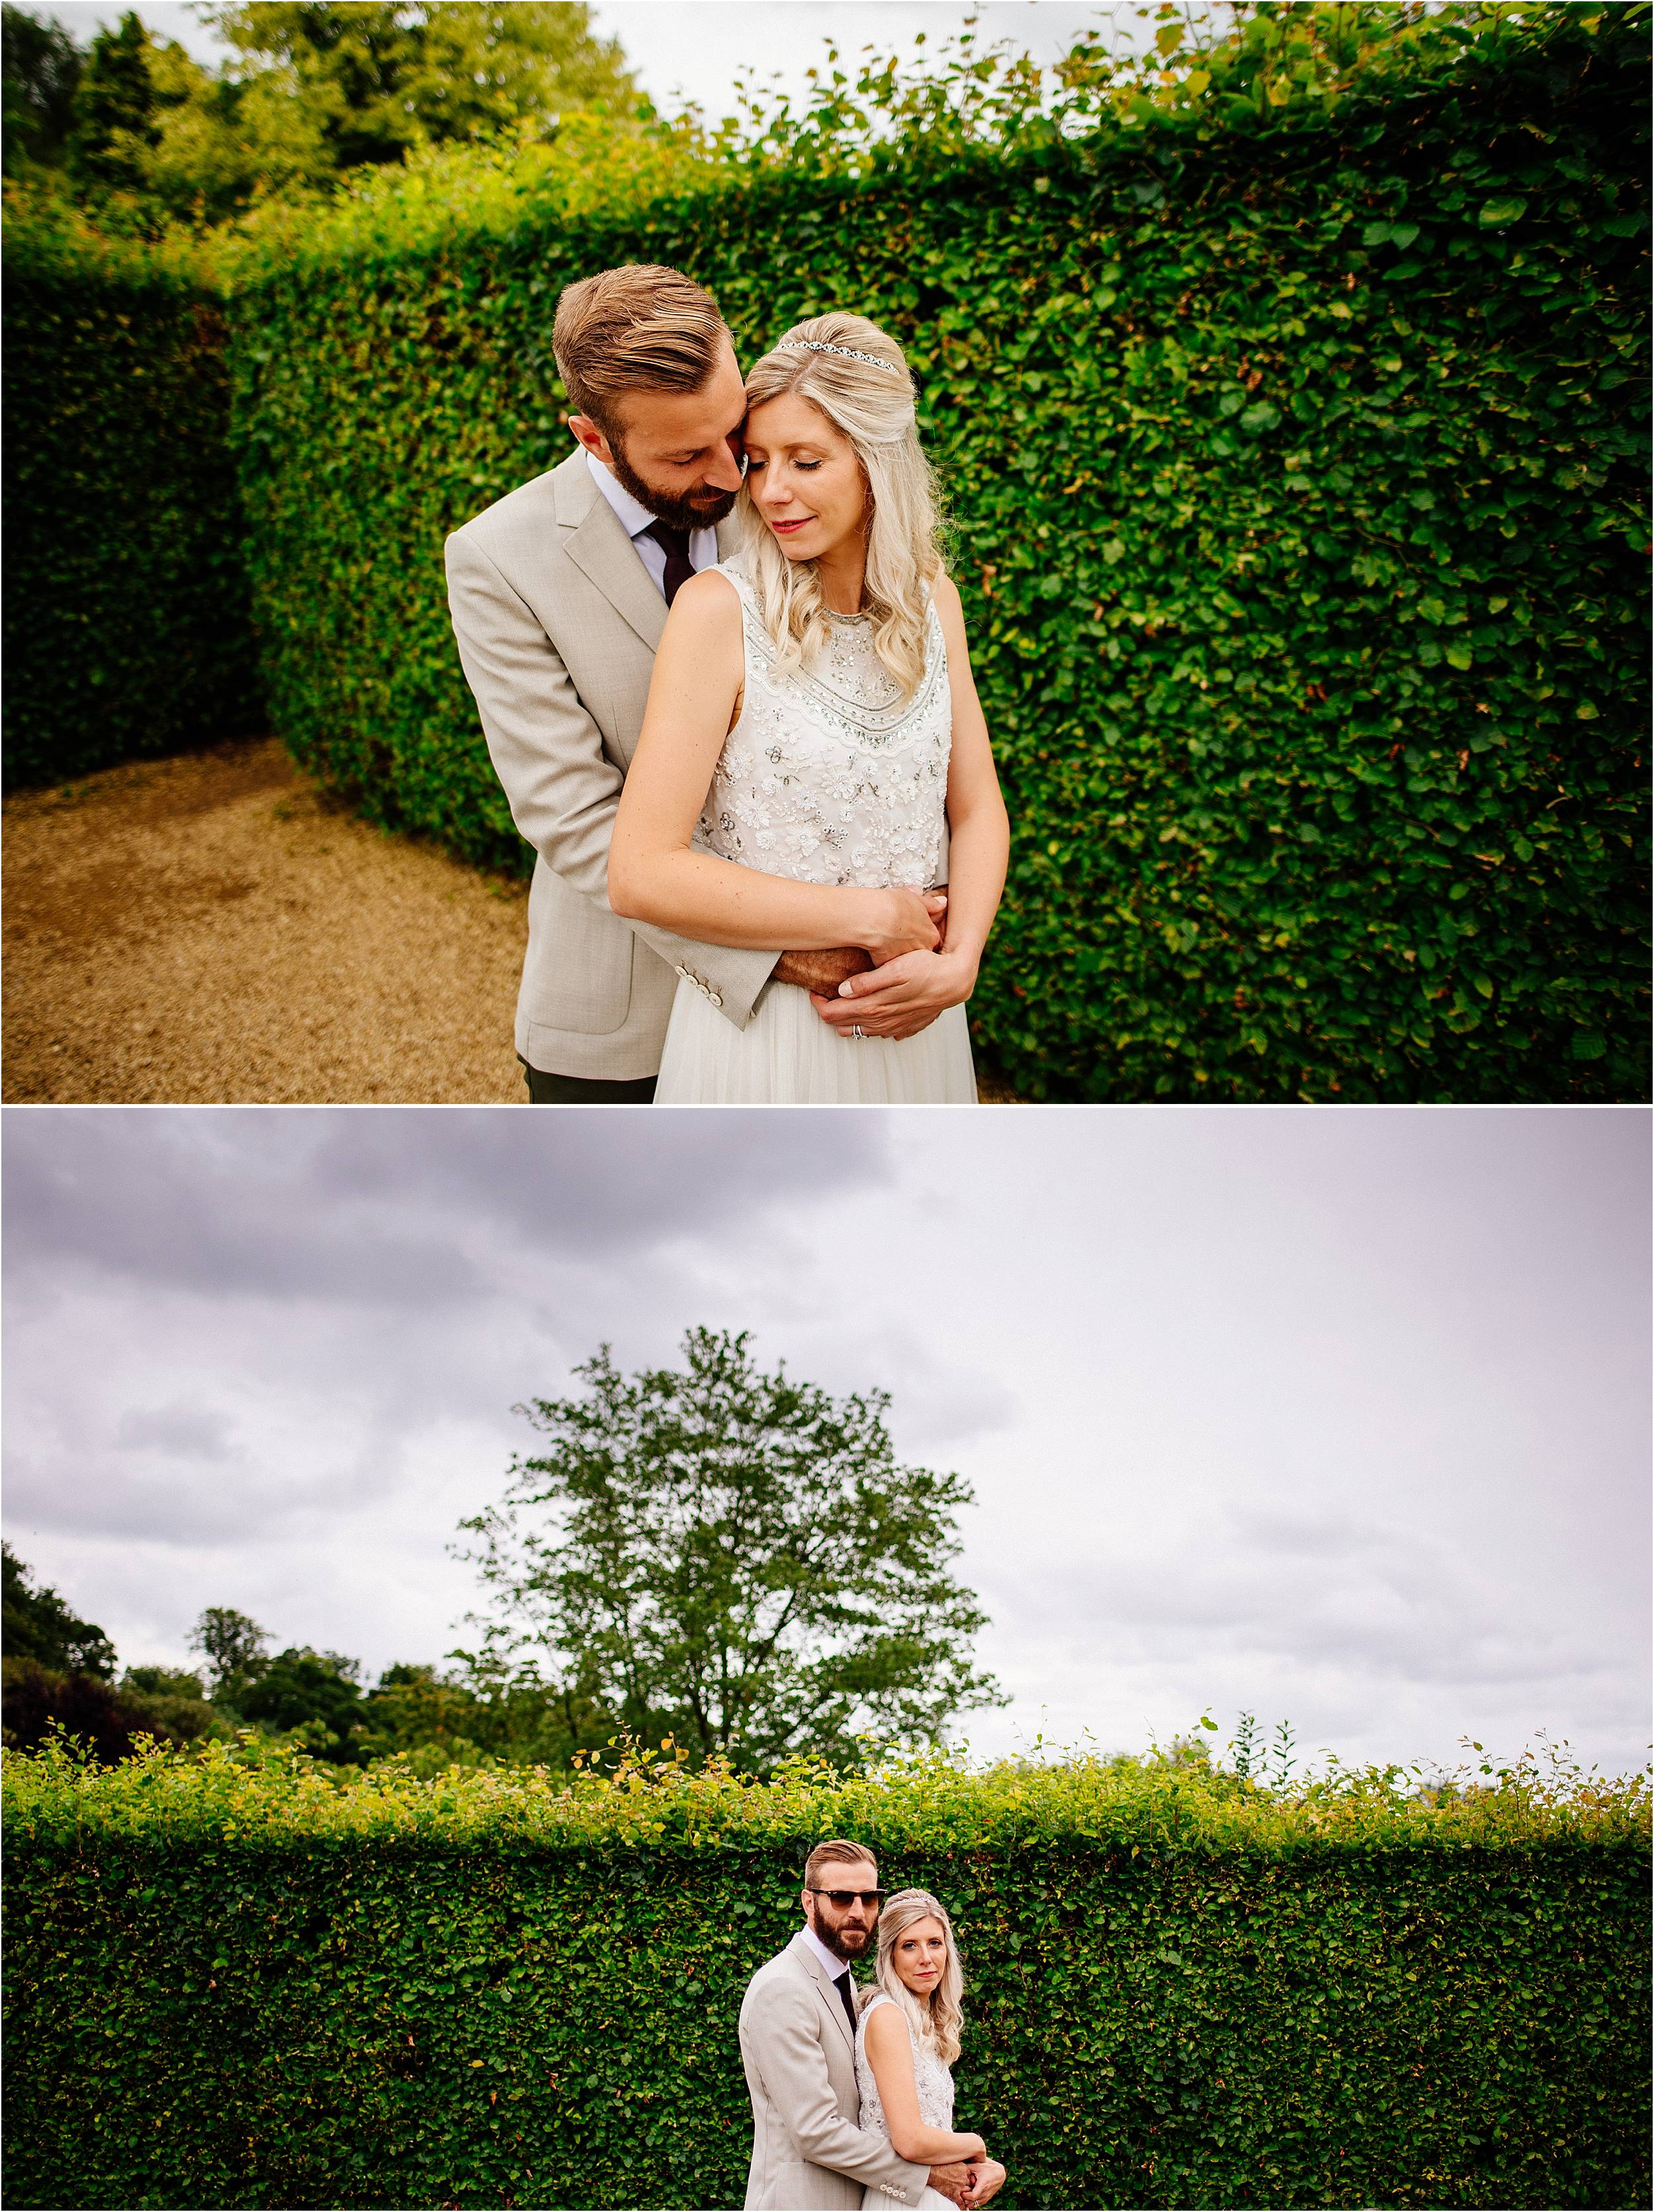 Barnsdale Gardens Wedding Photographer_0075.jpg